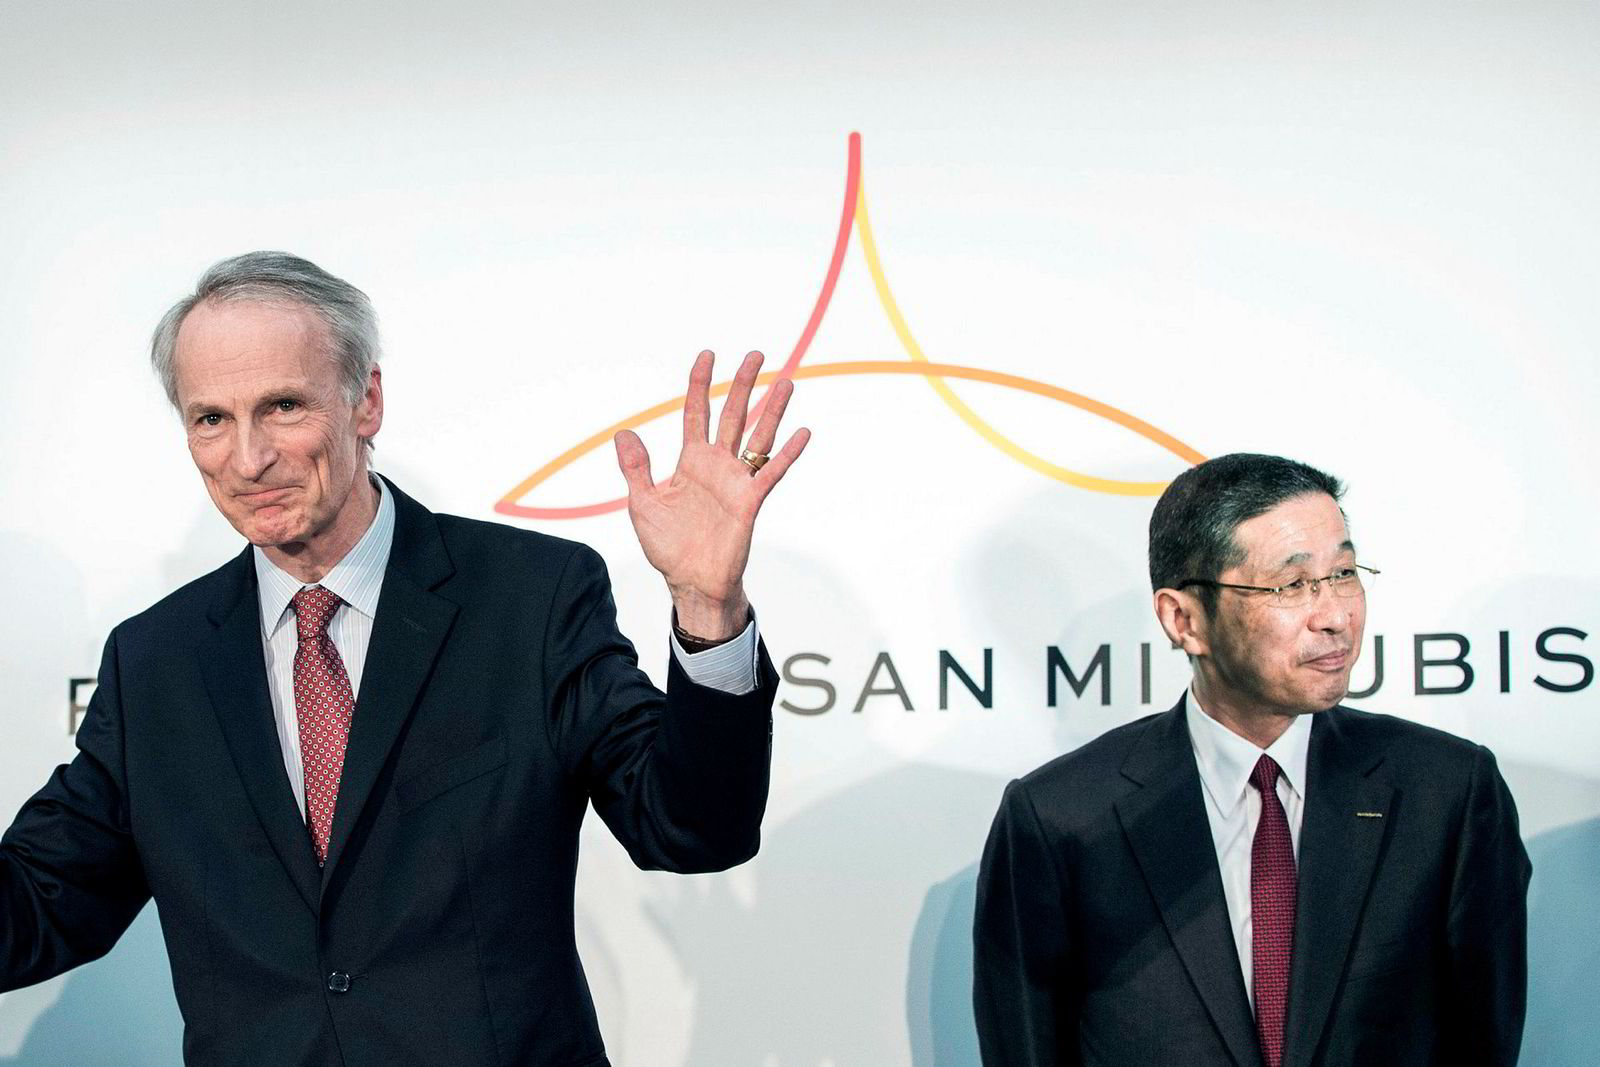 Renault styreformann Jean-Dominique Senard (til venstre) og Nissan Motors president og konsernsjef Hiroto Saikawa holdt en pressekonferanse om sitt samarbeid i Nissan hovedkvarteret i Yokohama, Kanagawa provinsen i mars.